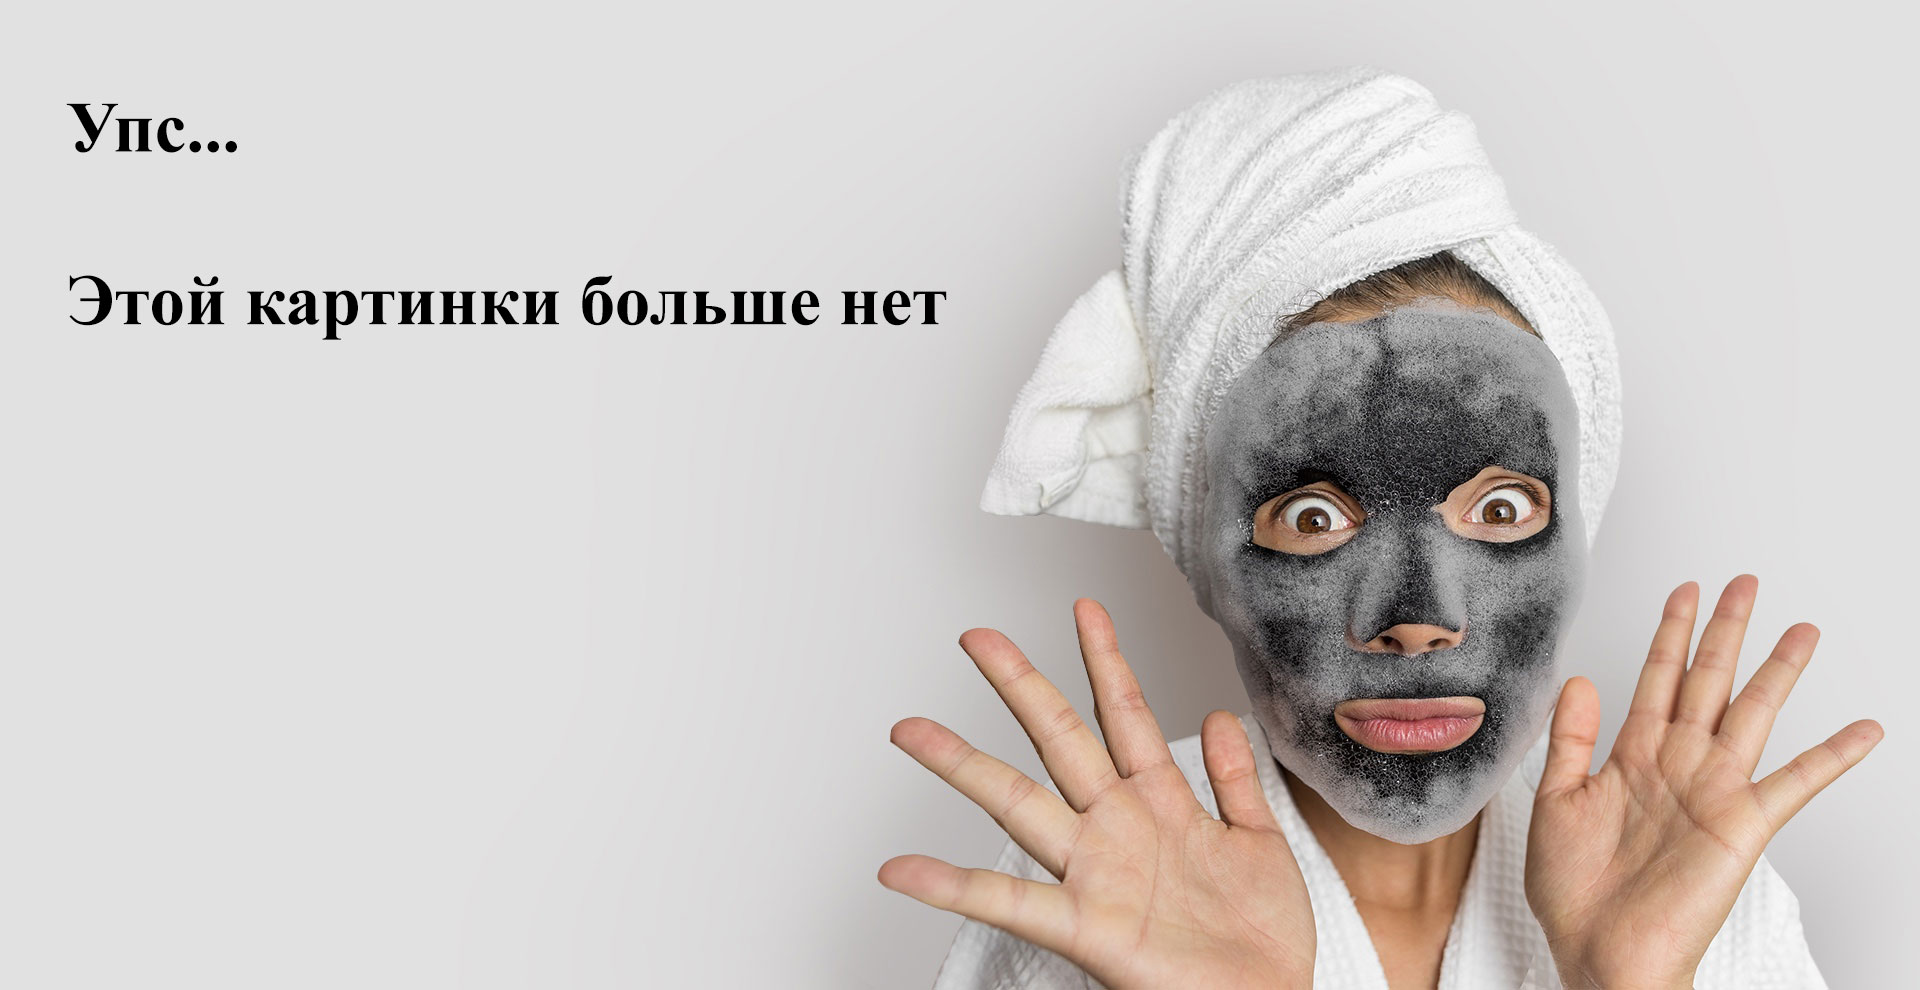 Staleks, Терка для стоп Beauty/Care 12/2, пластиковая, 100